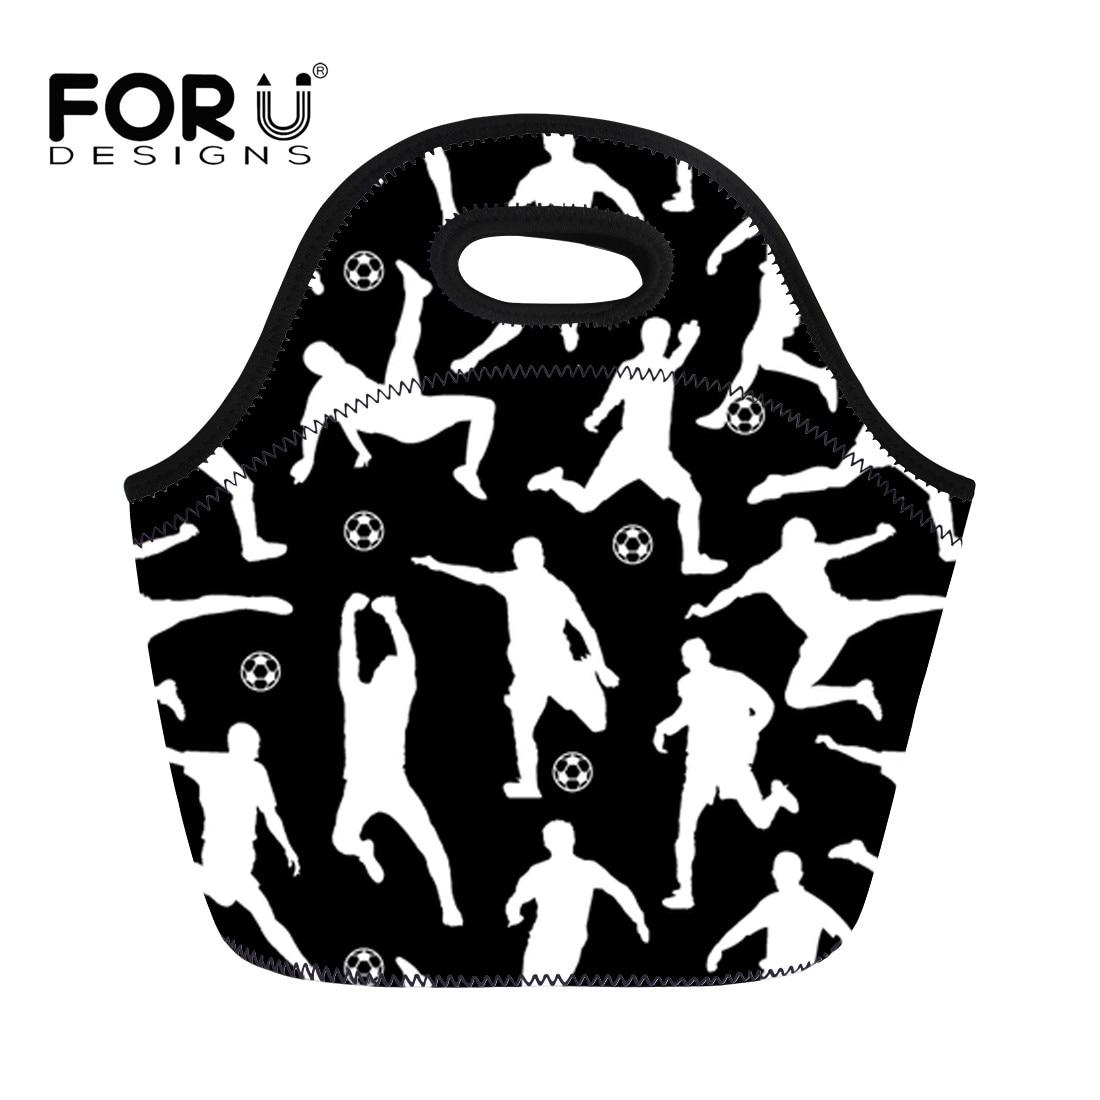 FORUDESIGNS Black Portable Insulated Lunch Bags for Women Kids Neoprene Cooler Food Picnic Tote Handbags Bolsa Termica Lancheira